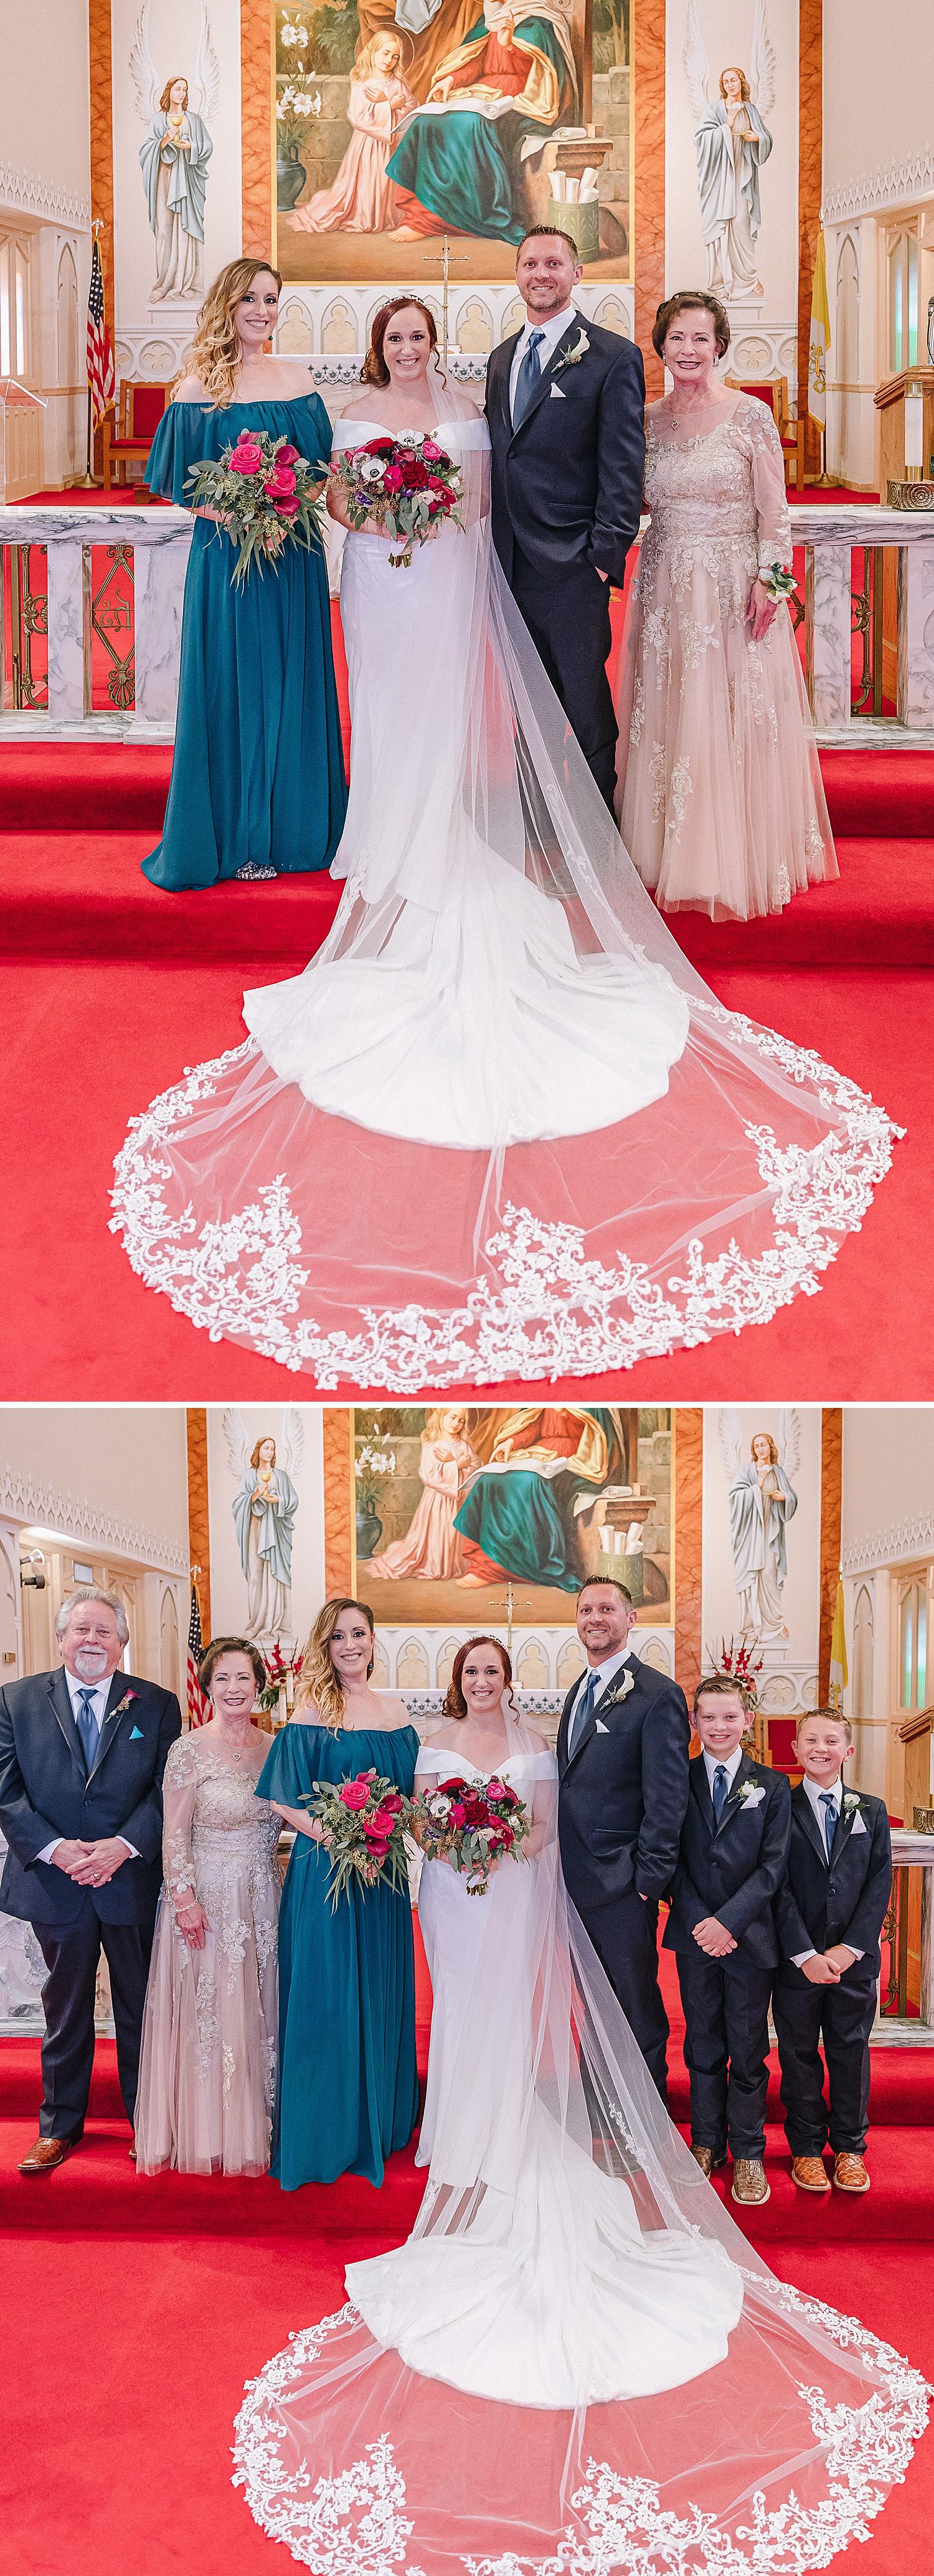 Jewel-Tone-Texas-Wedding-Valerie-Jason-Carly-Barton-Photography_0032.jpg